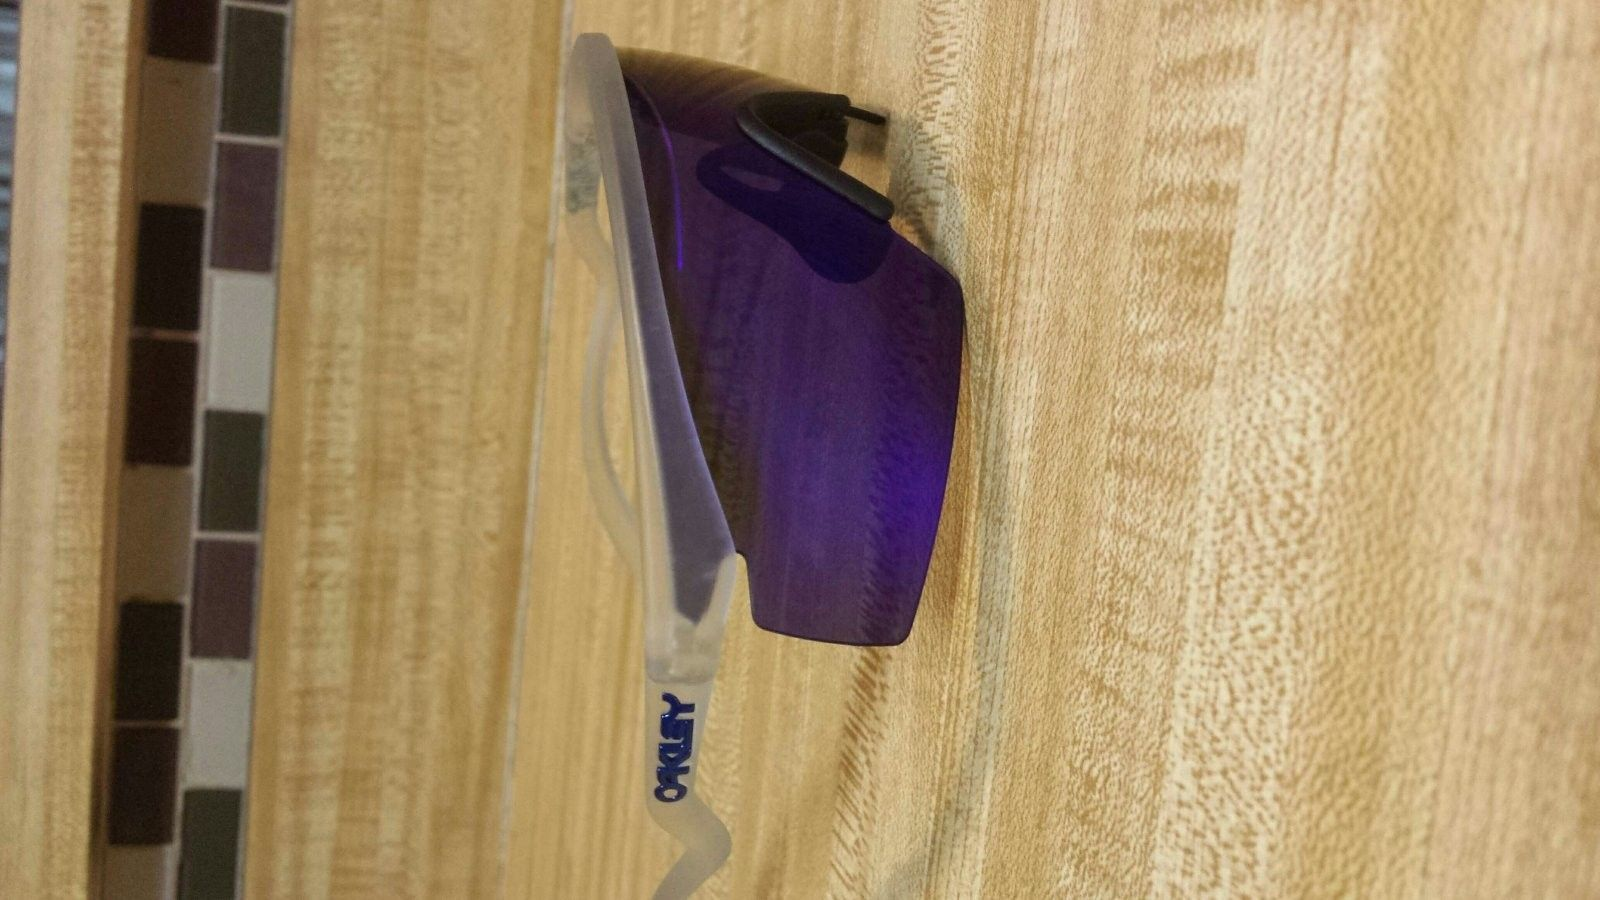 Oakley Razor Blades - uploadfromtaptalk1402679492313.jpg